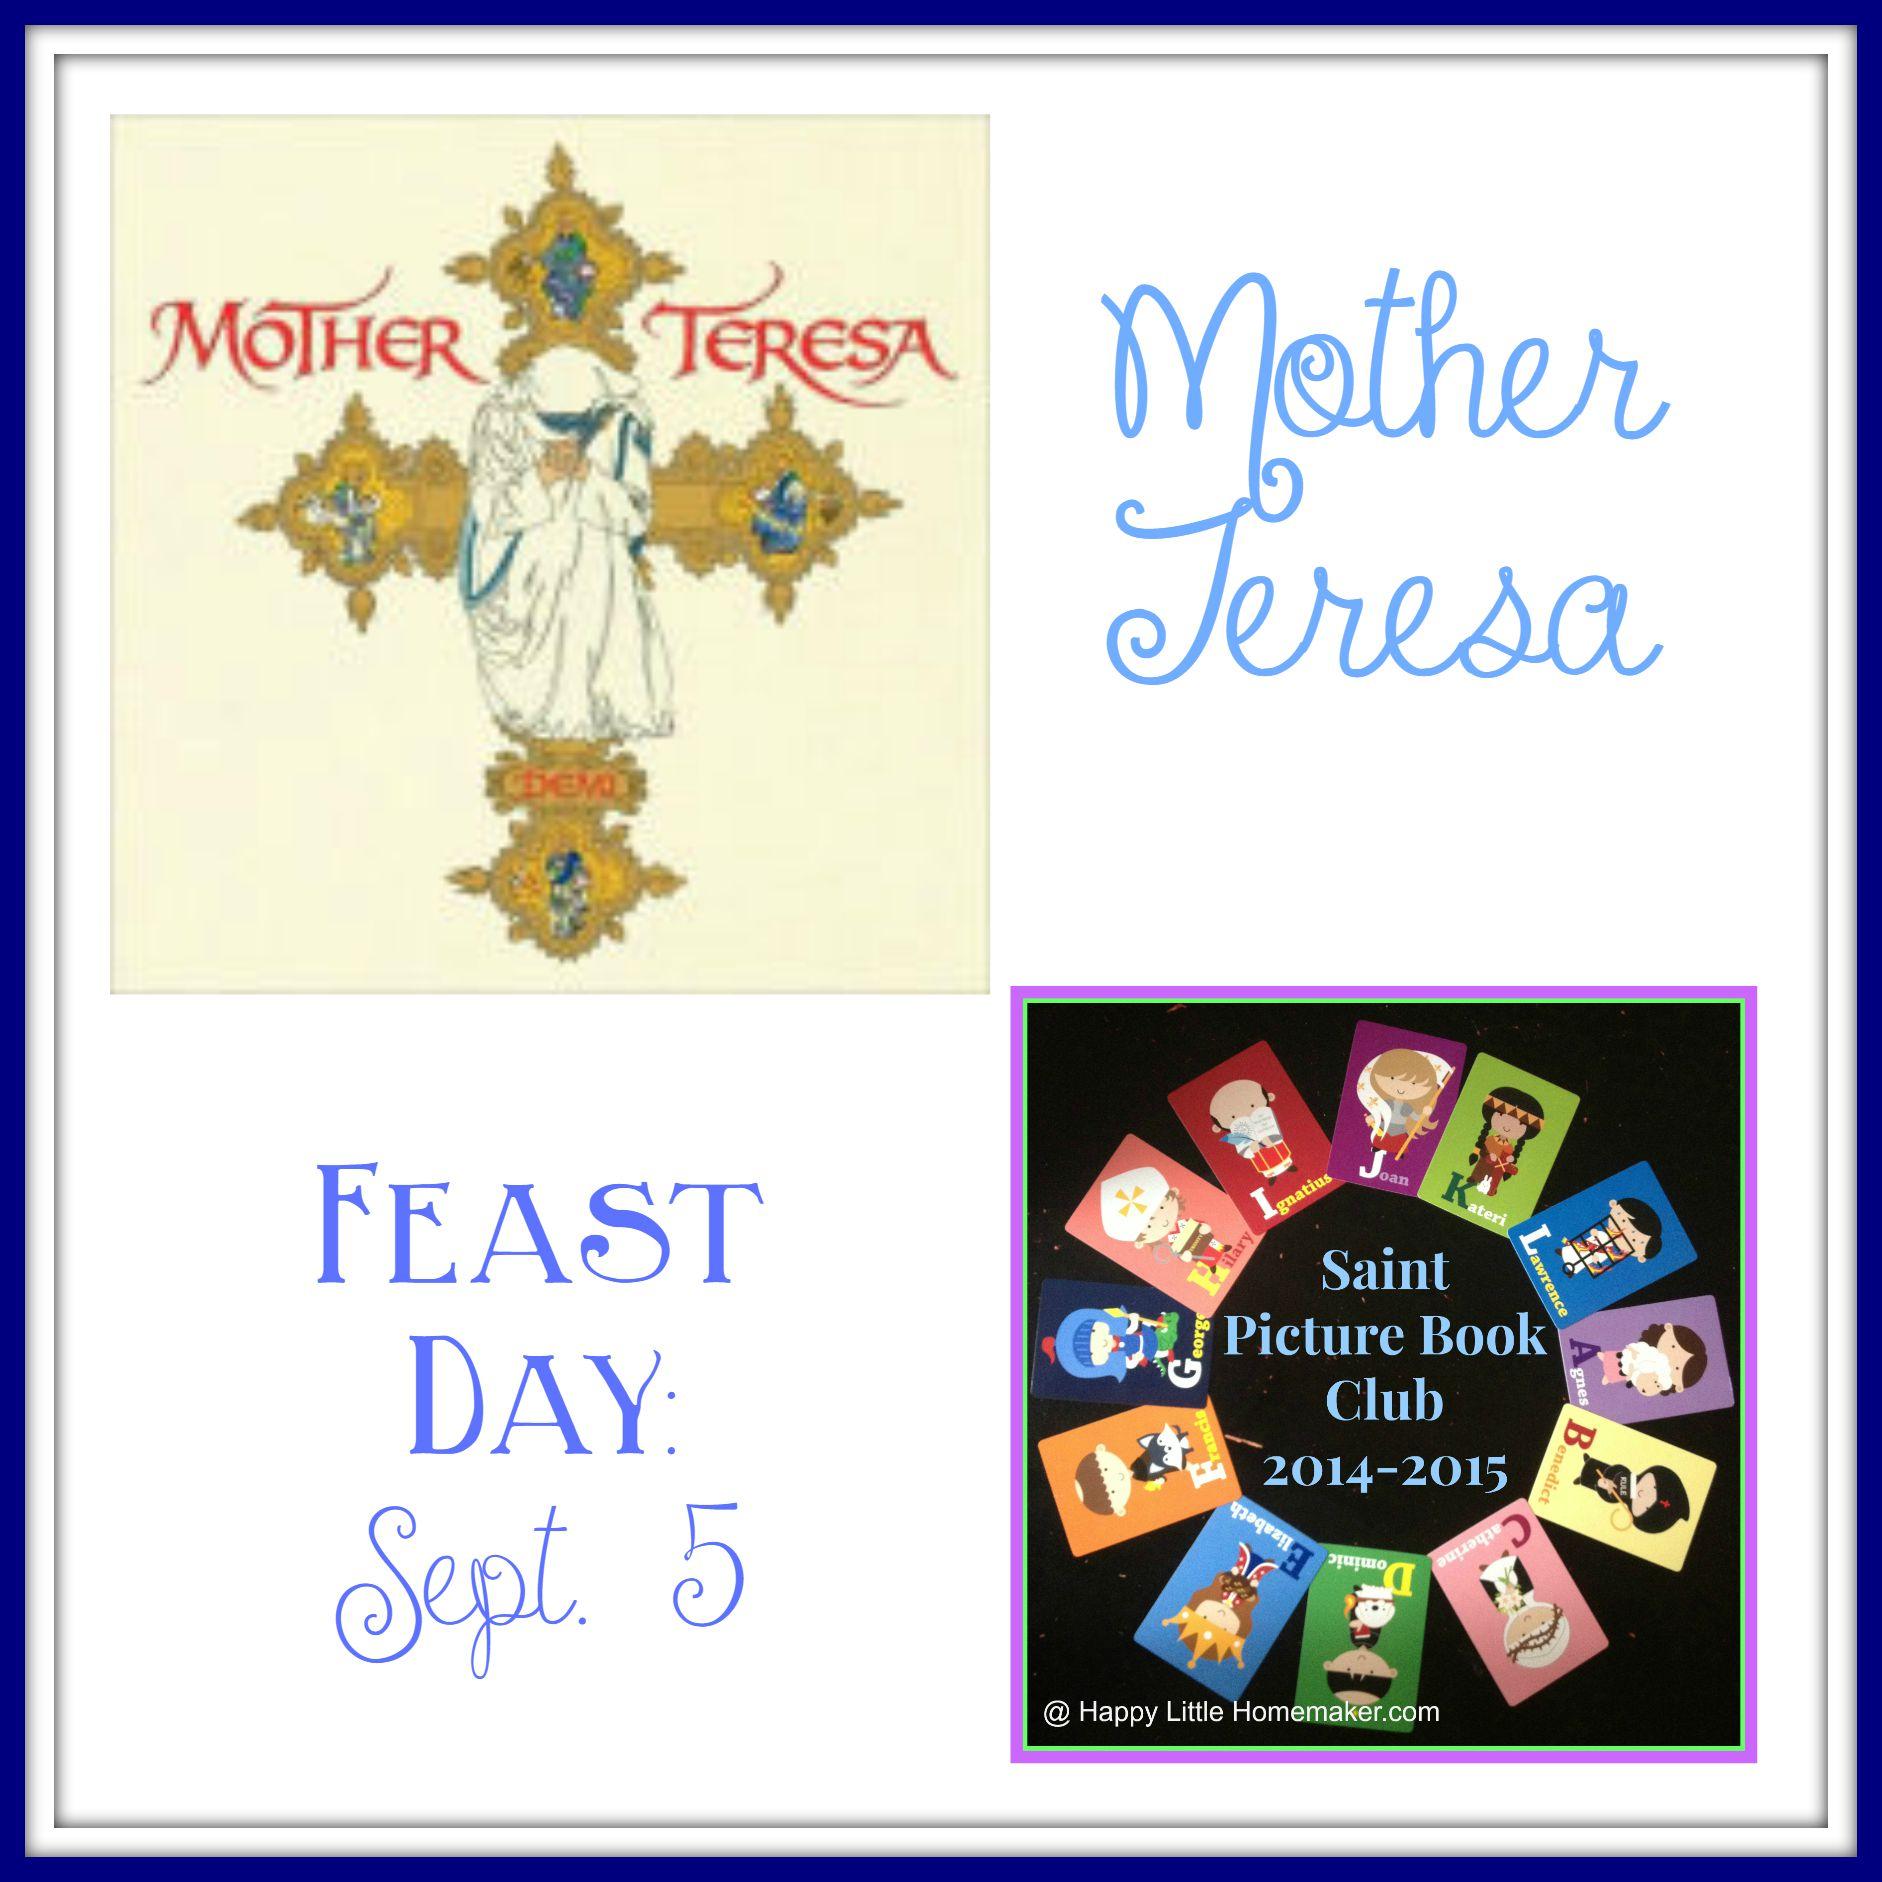 Saint Mother Teresa - September 5 - Saint Picture Book Club